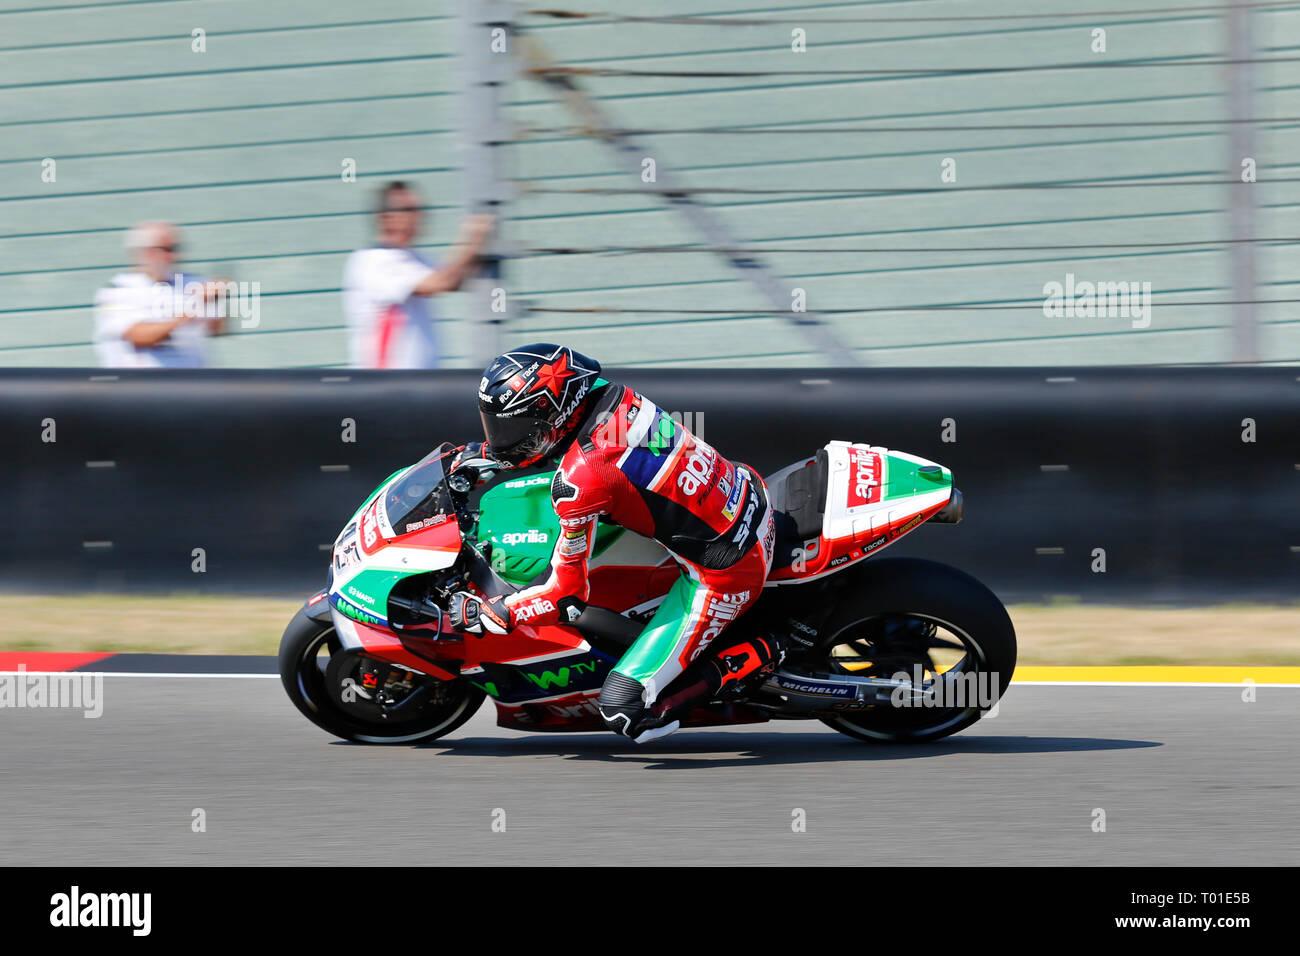 Scott Redding (GBR) of Aprilia Racing Team Gresini, MotoGP World Championship 2018, Pramac Motorrad Grand Prix Deutschland, Sachsenring, 13.07.2018 - Stock Image